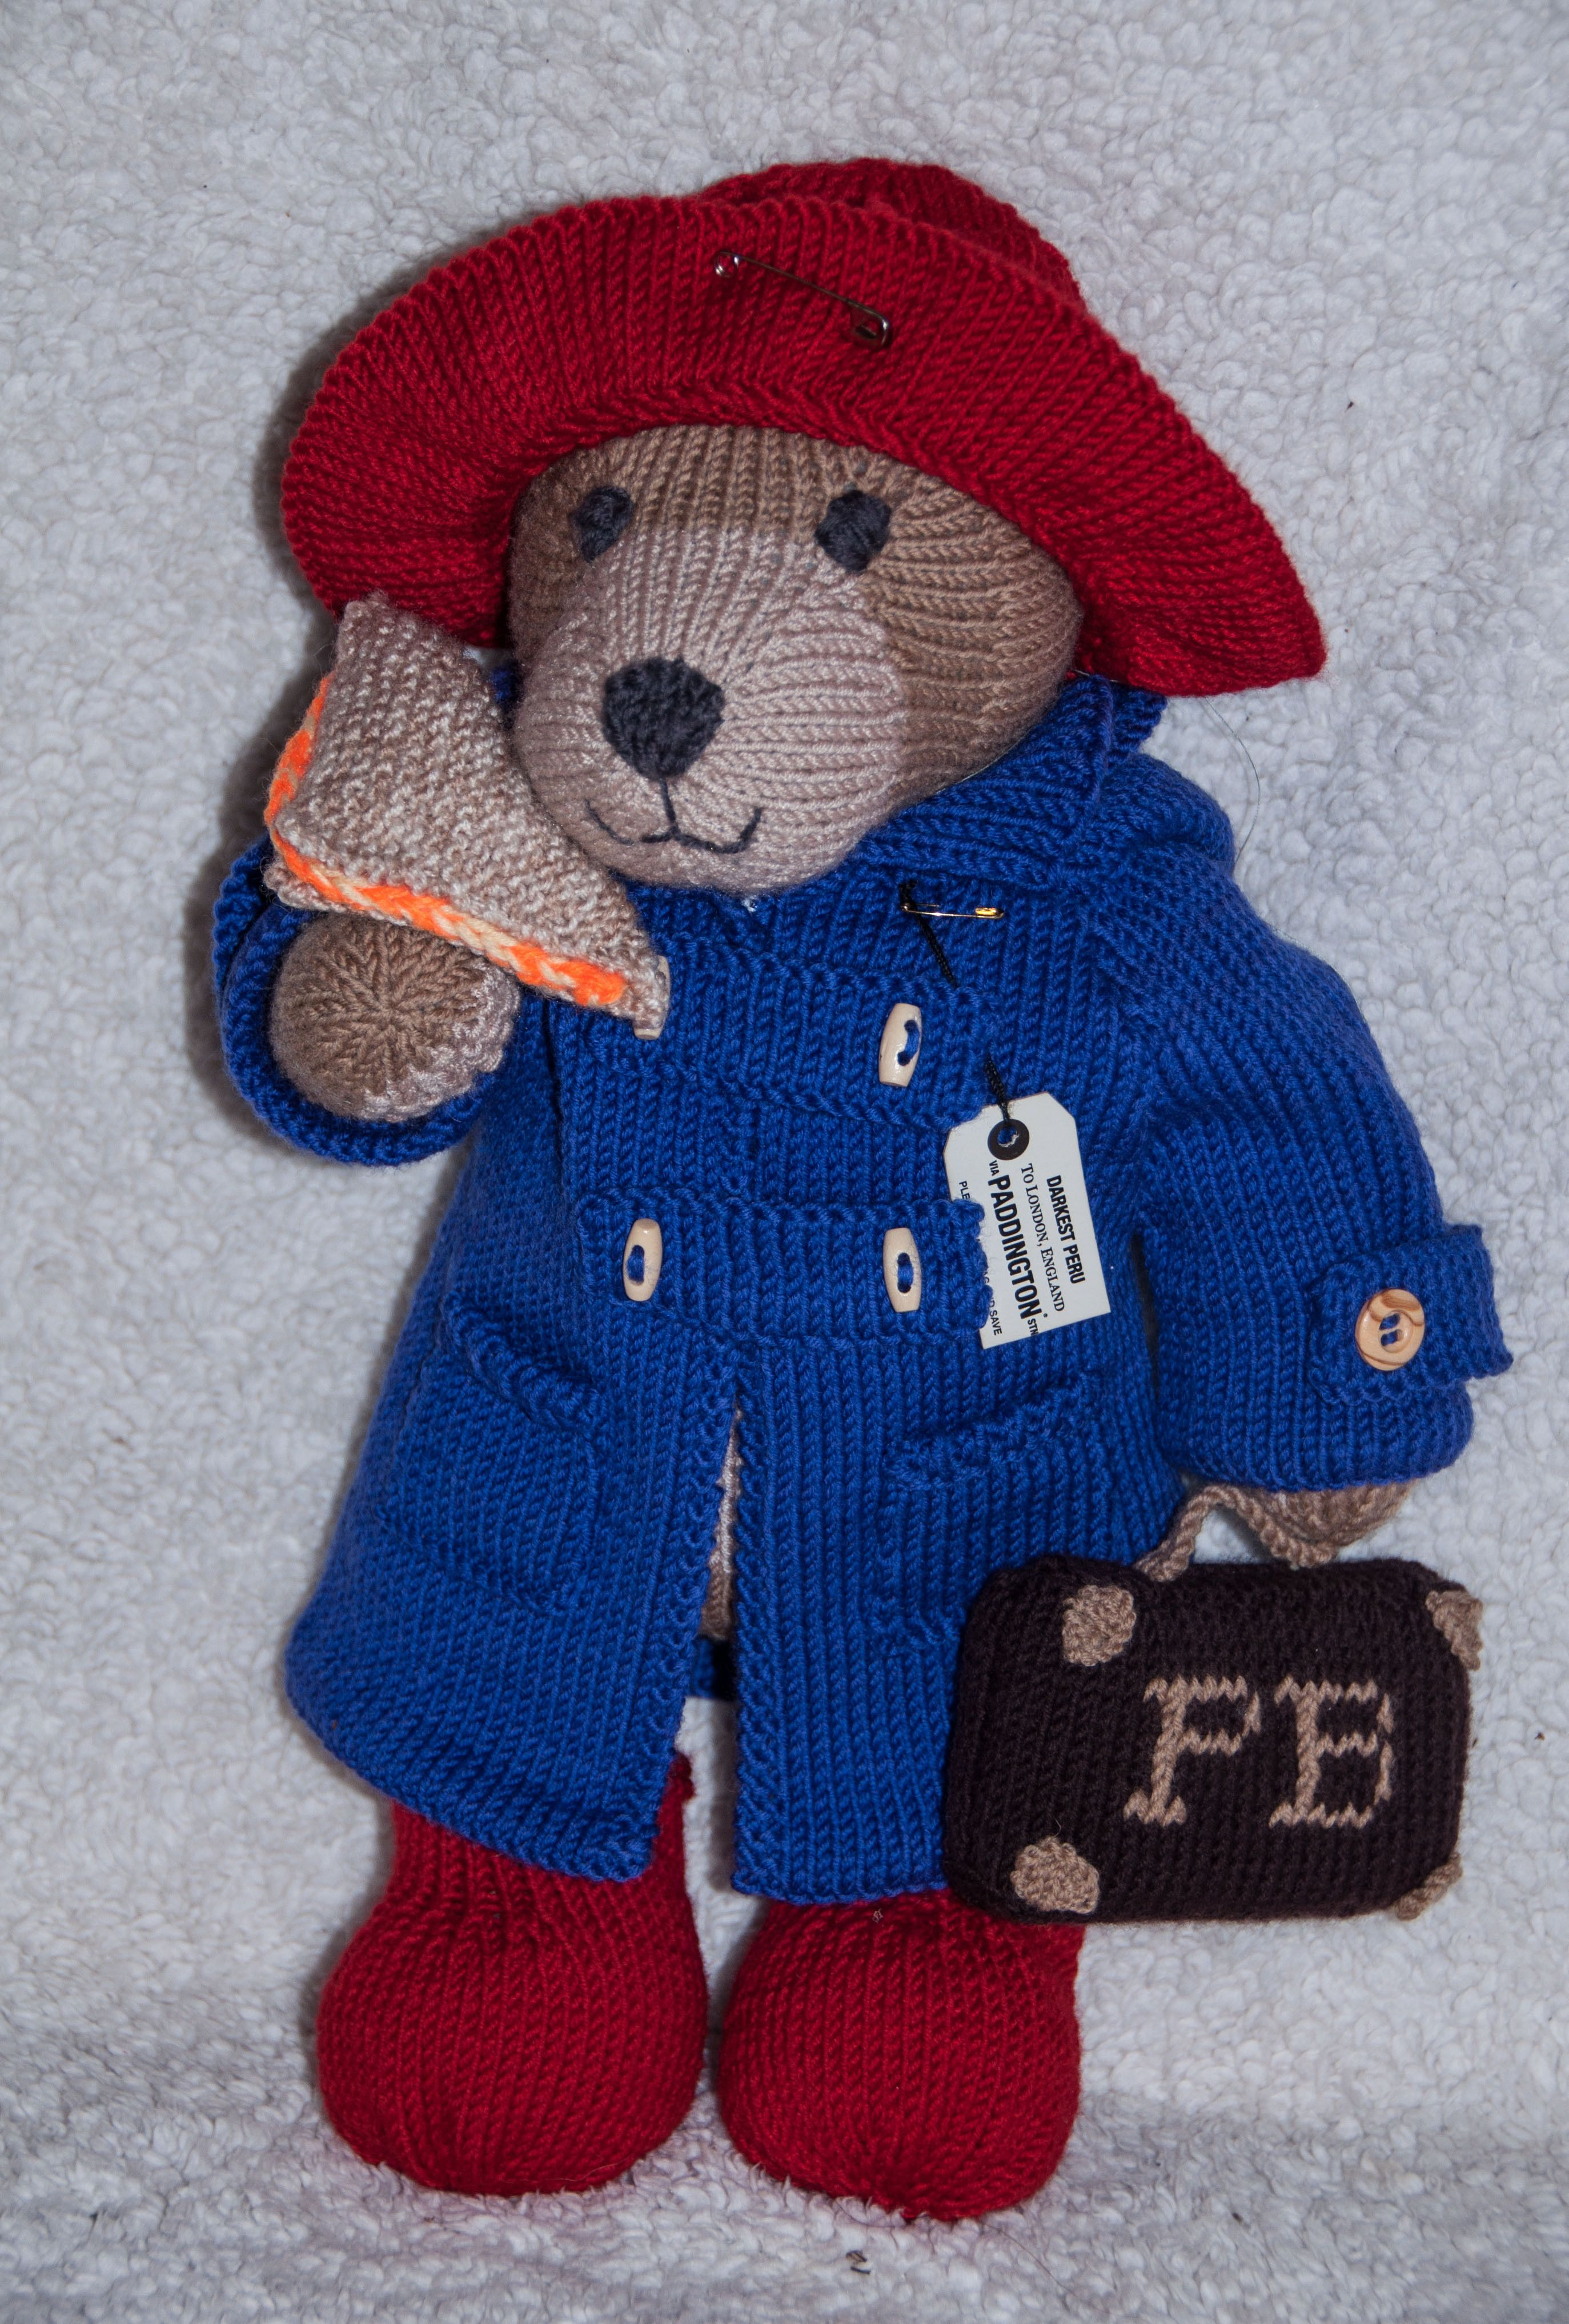 Paddington bear knitting project by cheryl m knitting patterns paddington bear knitting project by cheryl m bankloansurffo Choice Image